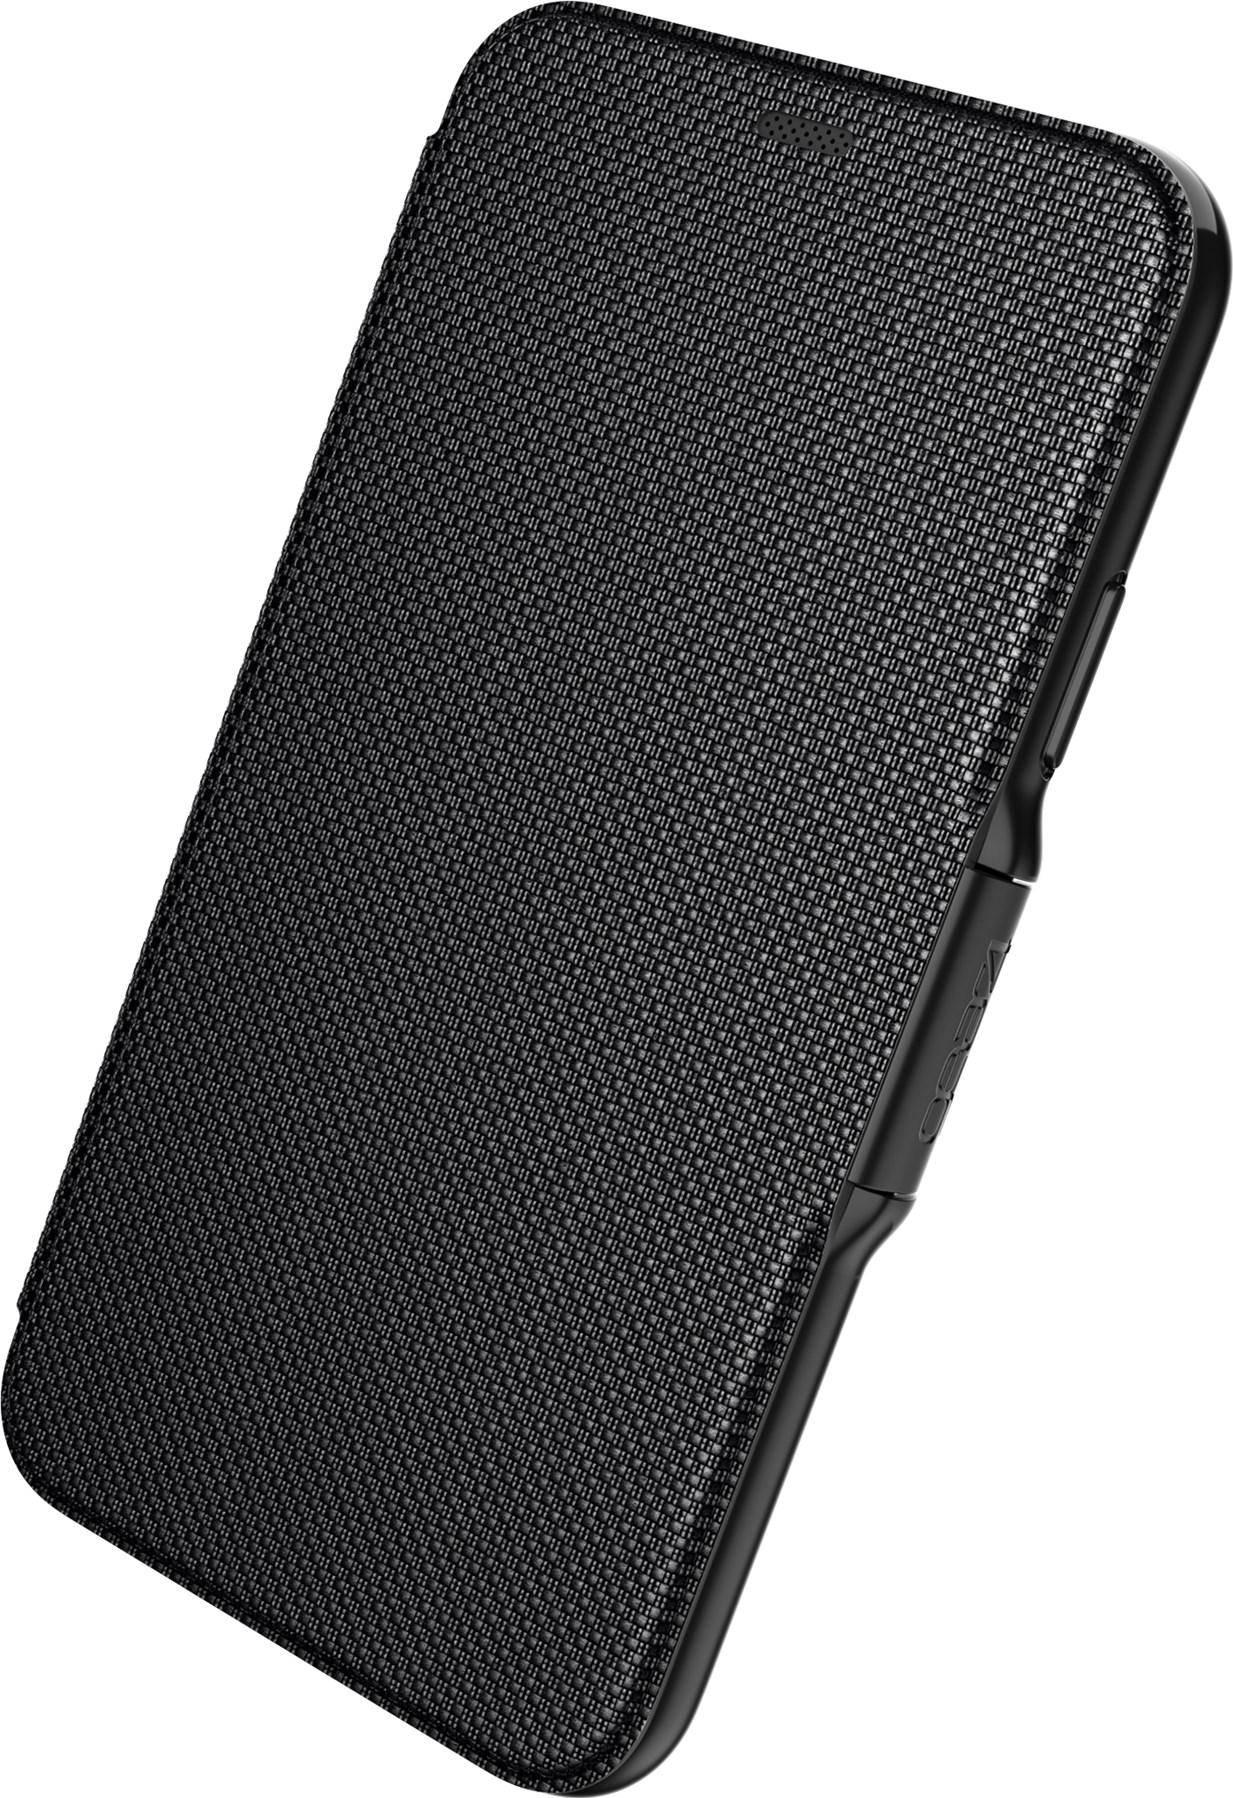 gear4 D3o Oxford Iphone 11 Pro Max Black